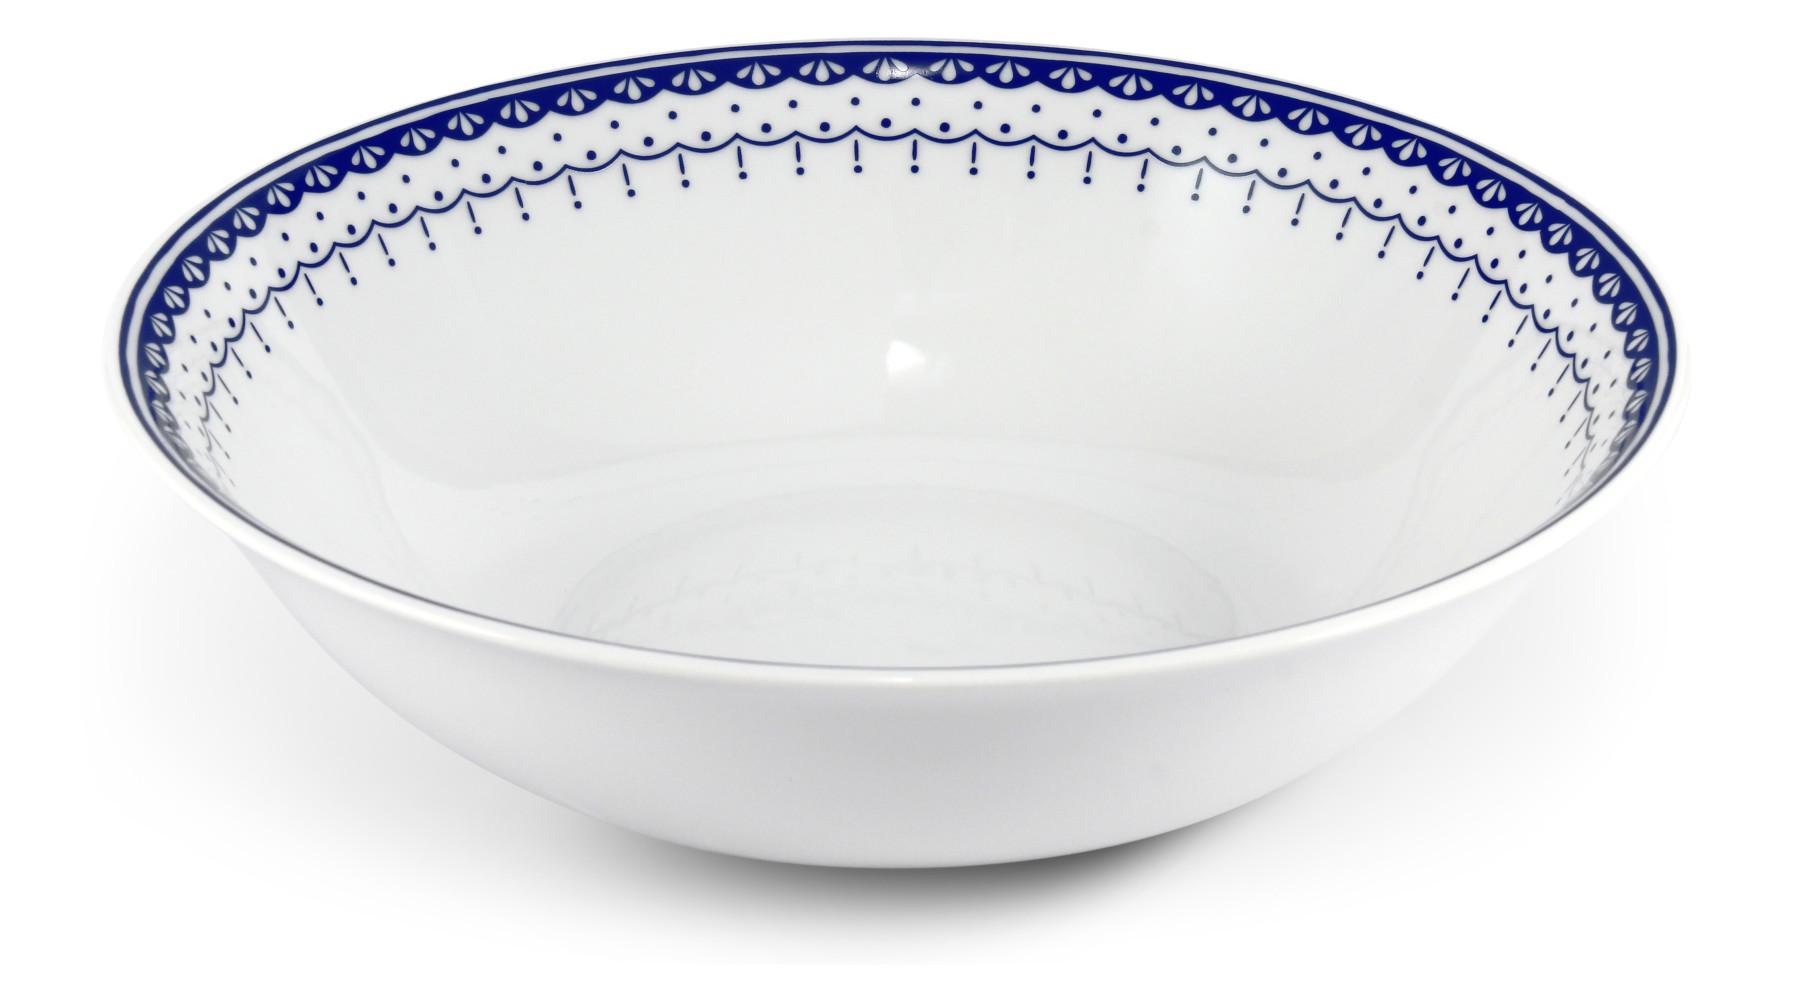 Salatschüssel 26cm HyggeLine